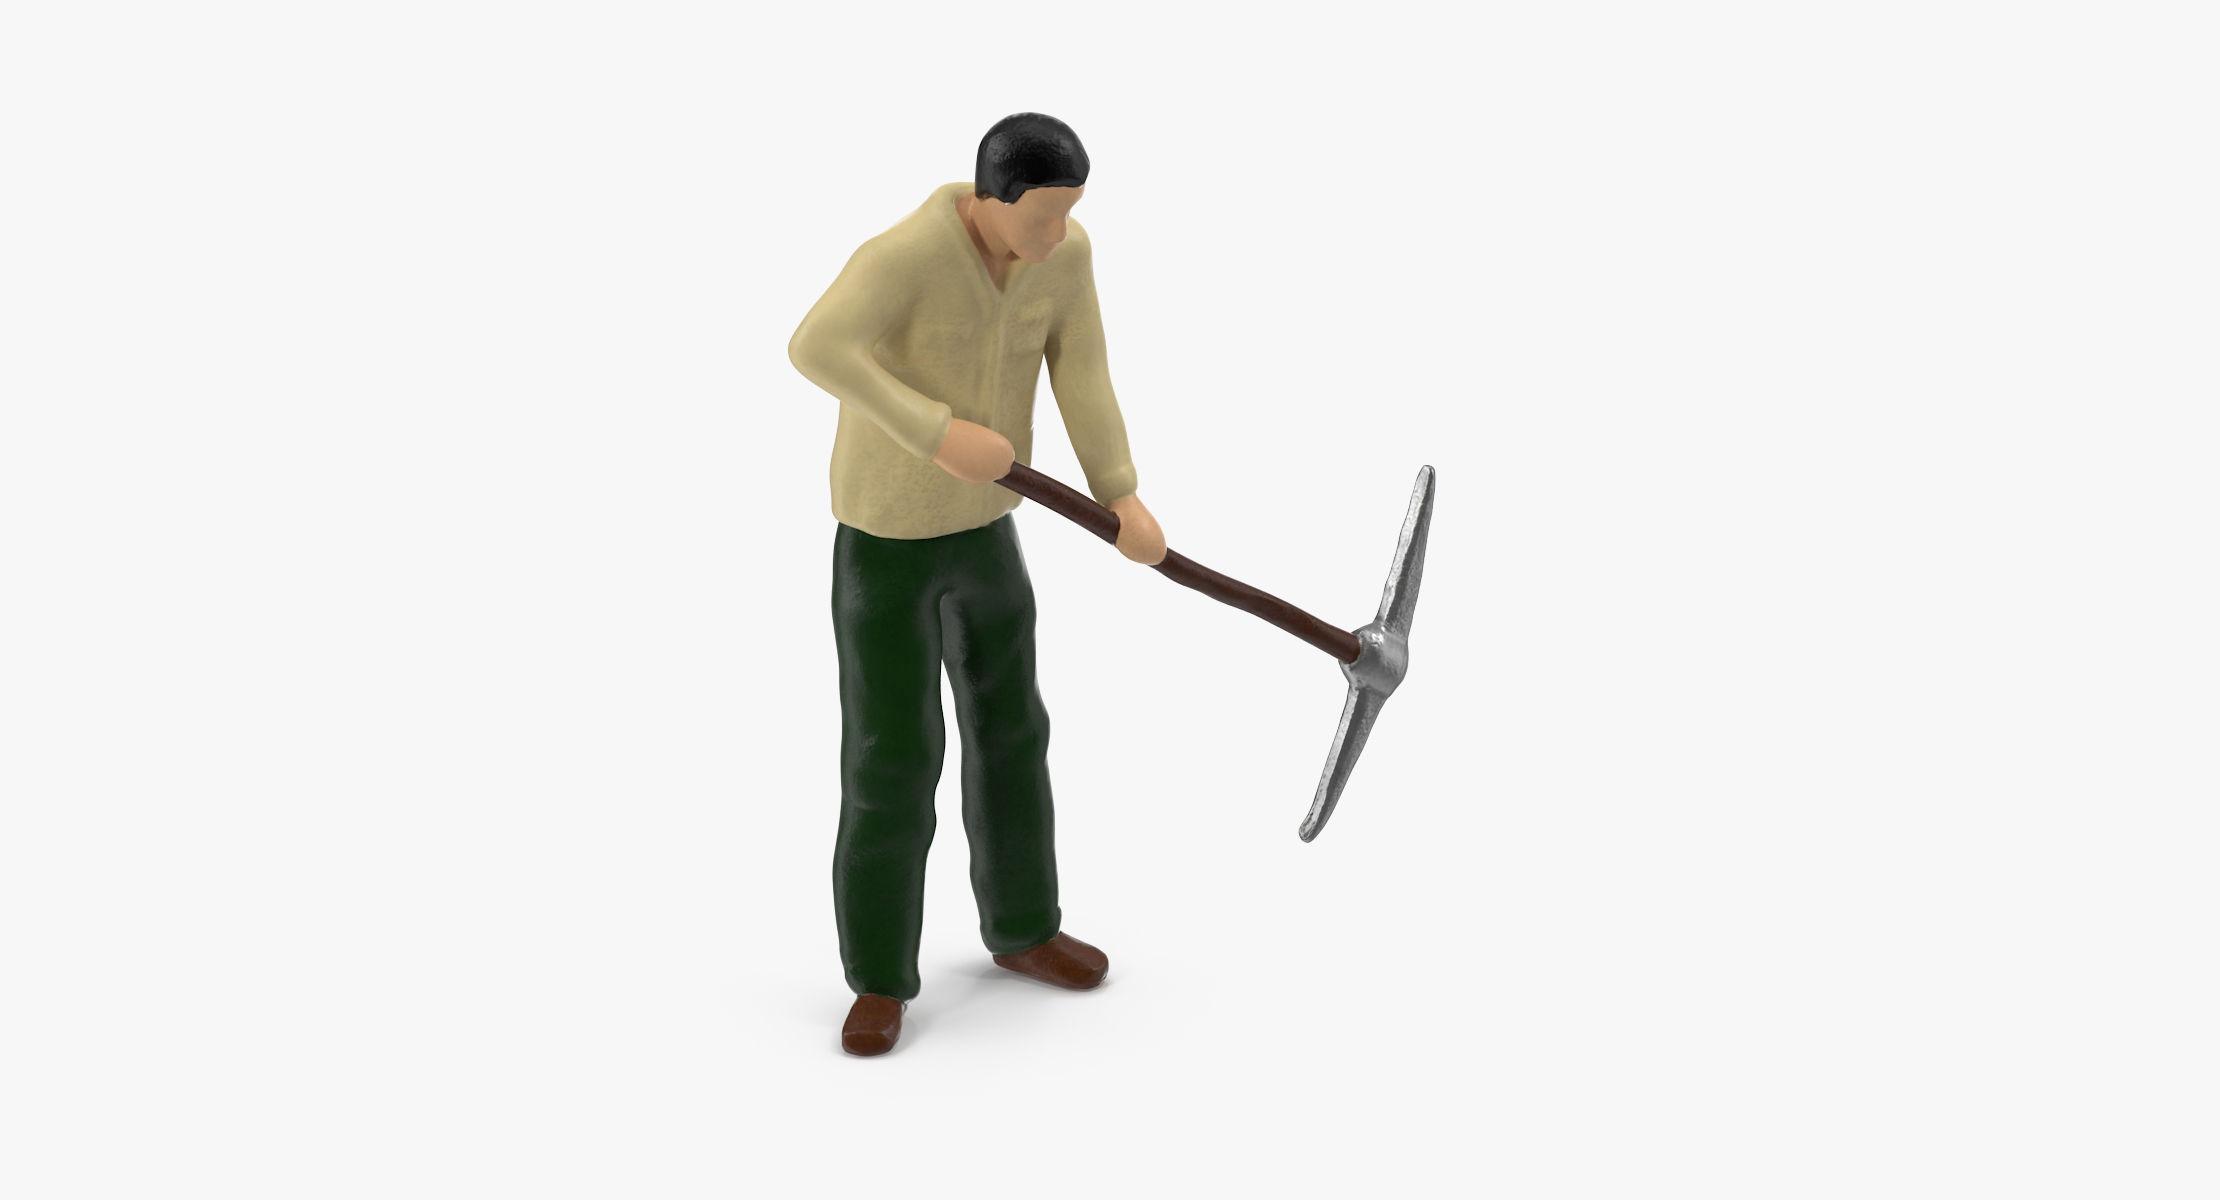 Miniature Man At Work 02 - reel 1